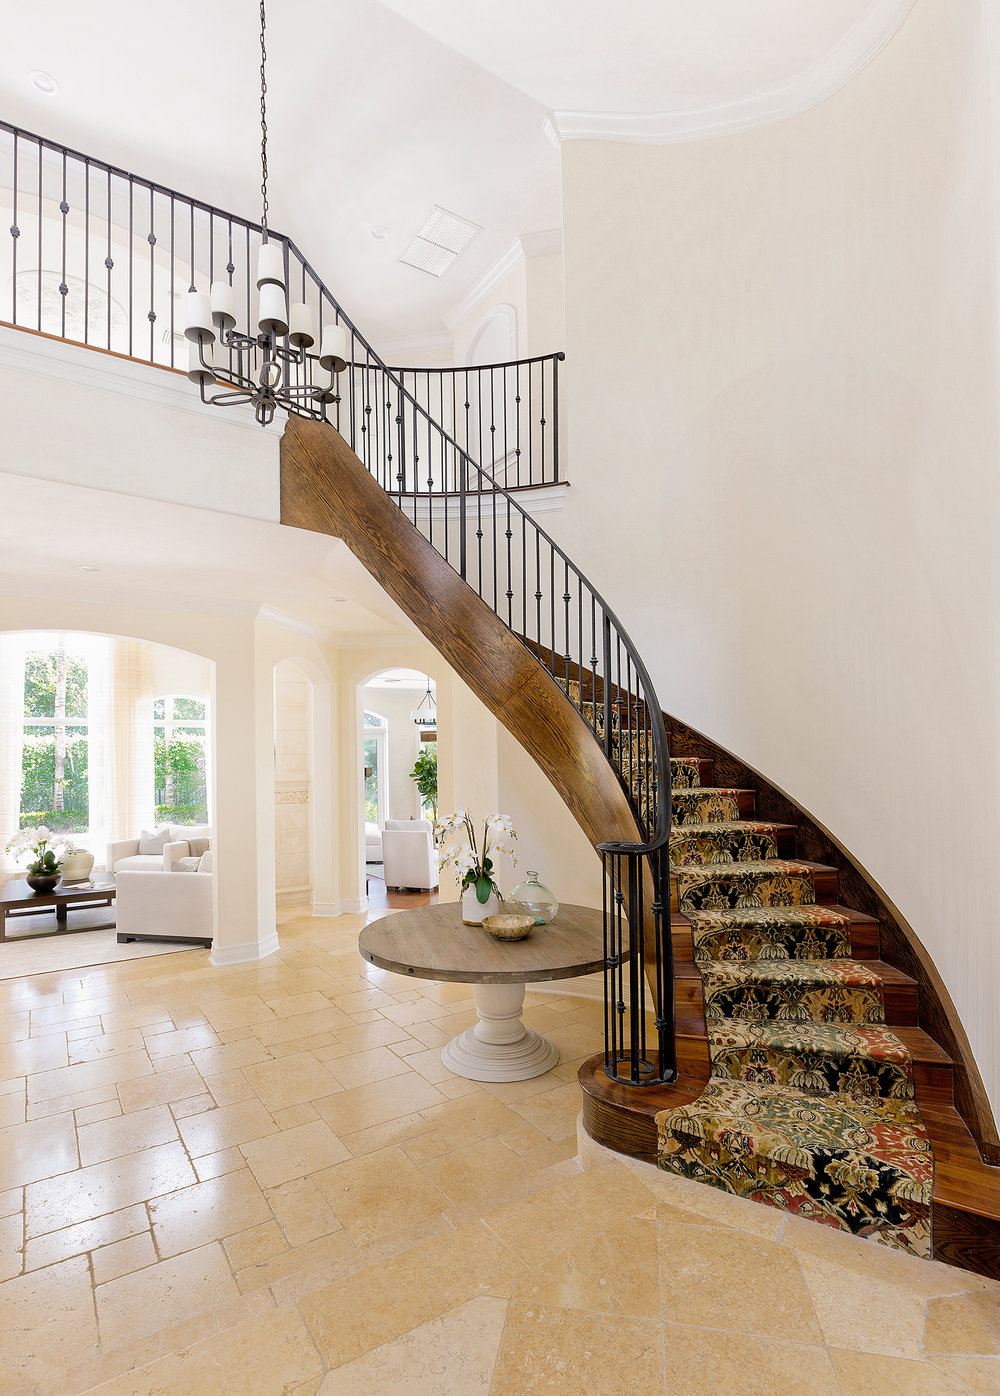 09_Stairwell.jpg